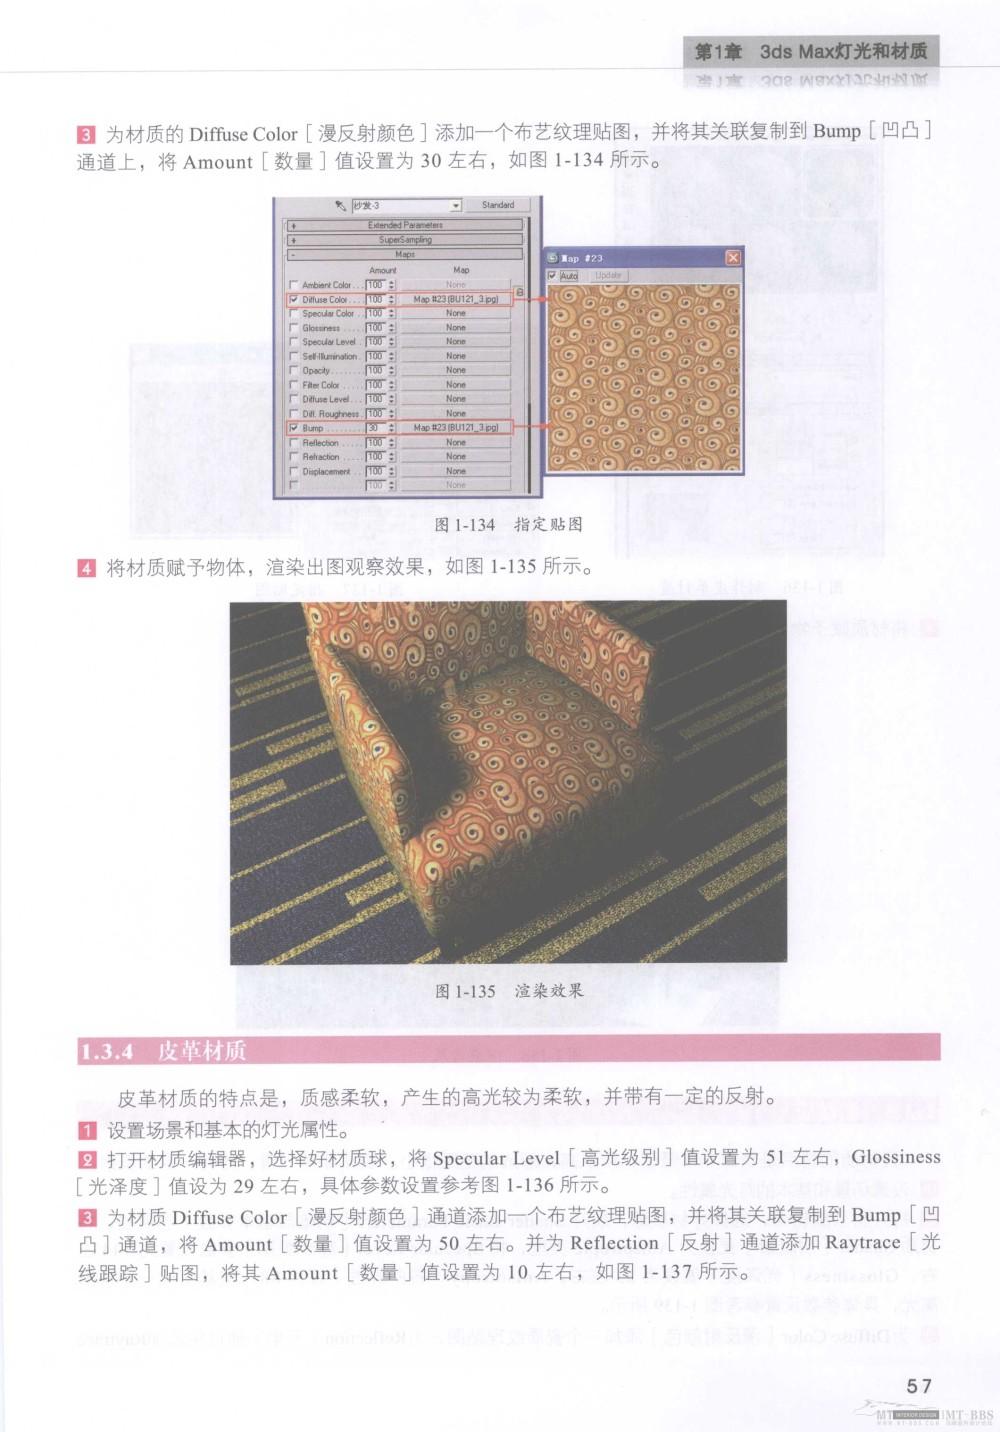 水晶石技法-3ds_Max&VRay室内空间表现_水晶石技法-3ds_Max&VRay室内空间表现_页面_063.jpg